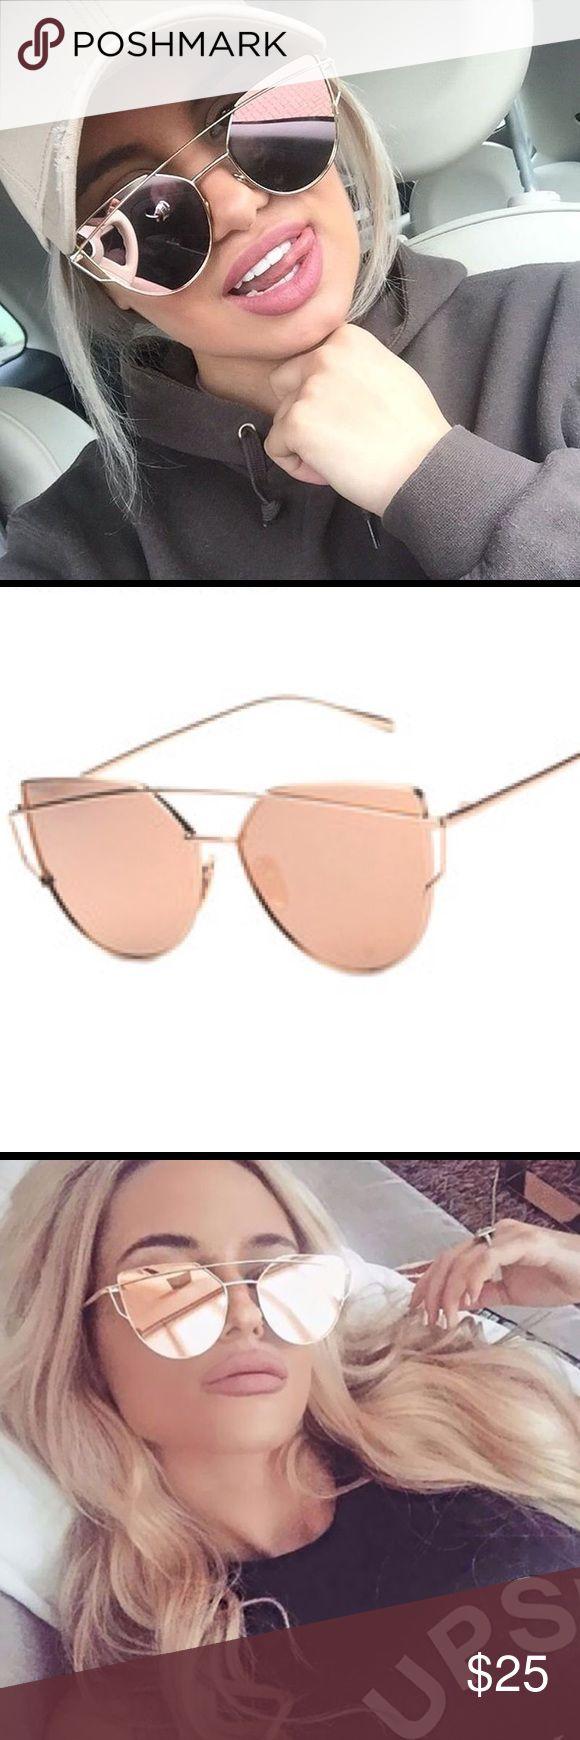 ⚡️New ⚡️ ROSE GOLD FASHION SUNGLASSES.  AVIATORS Mirrored cat eye sunglasses. Height of lens 50mm.   So gorgeous on . Accessories Sunglasses